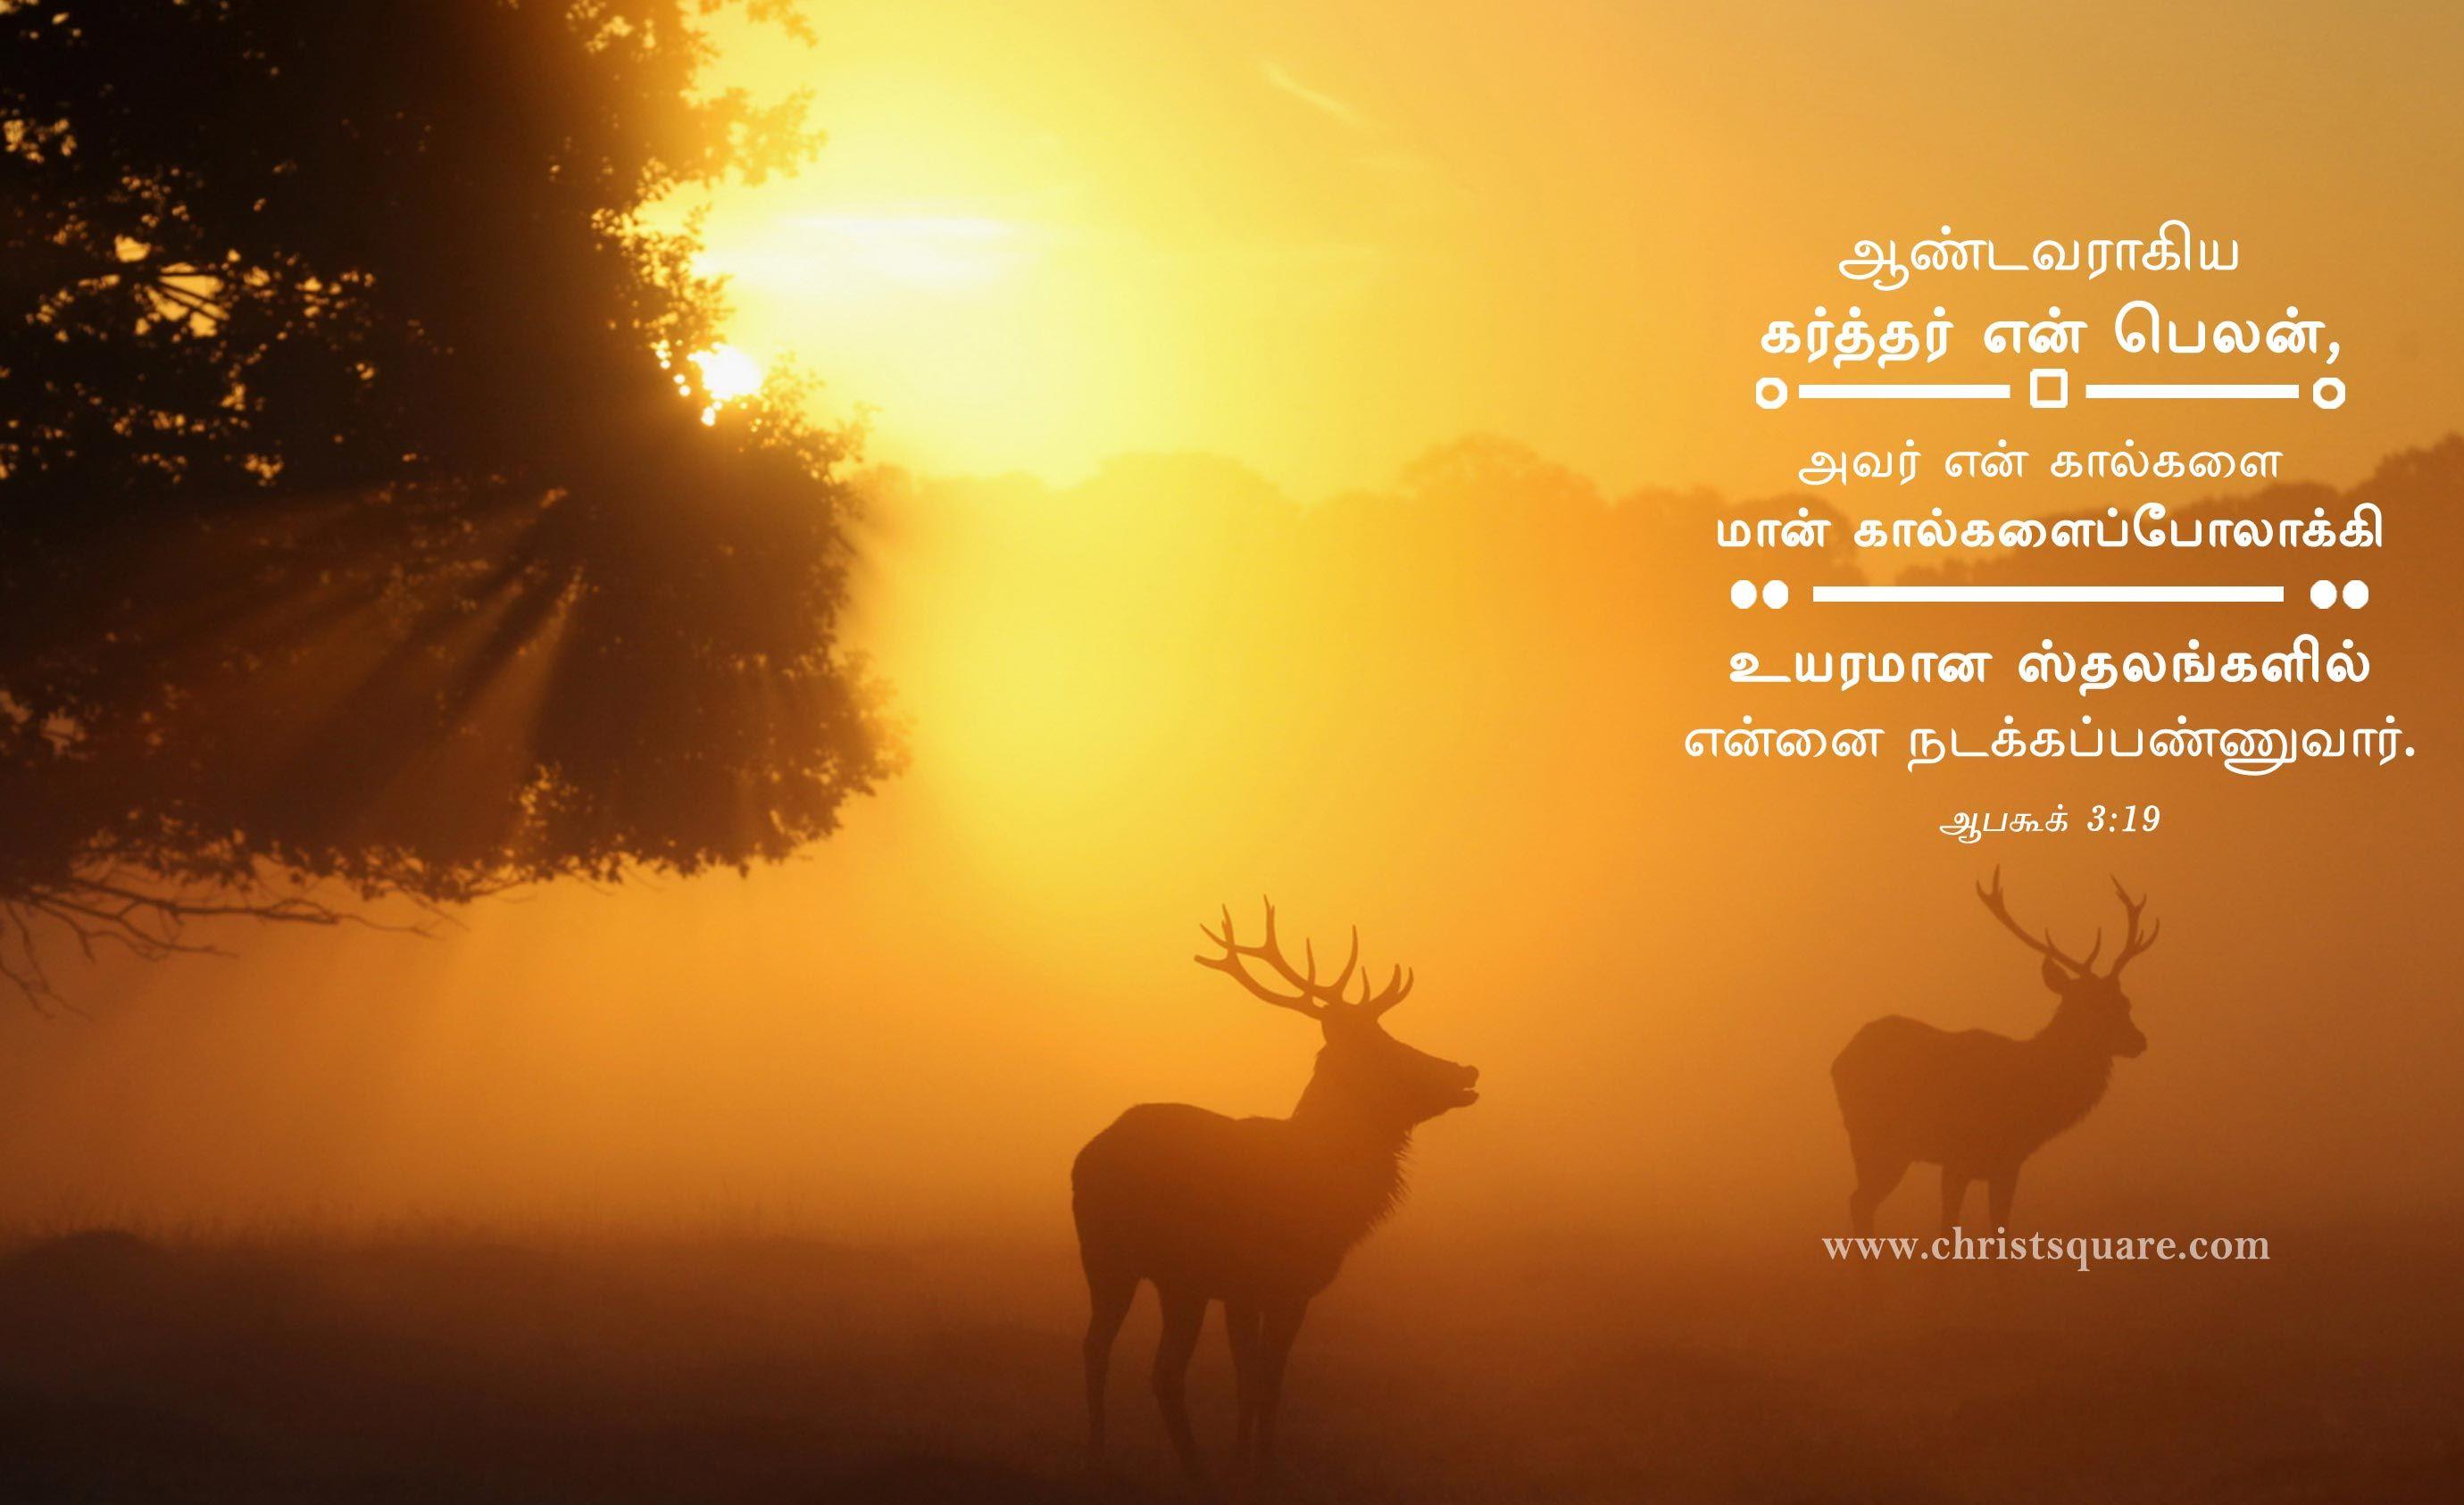 Tamil Christian Wallpaper HD Words Image Verses